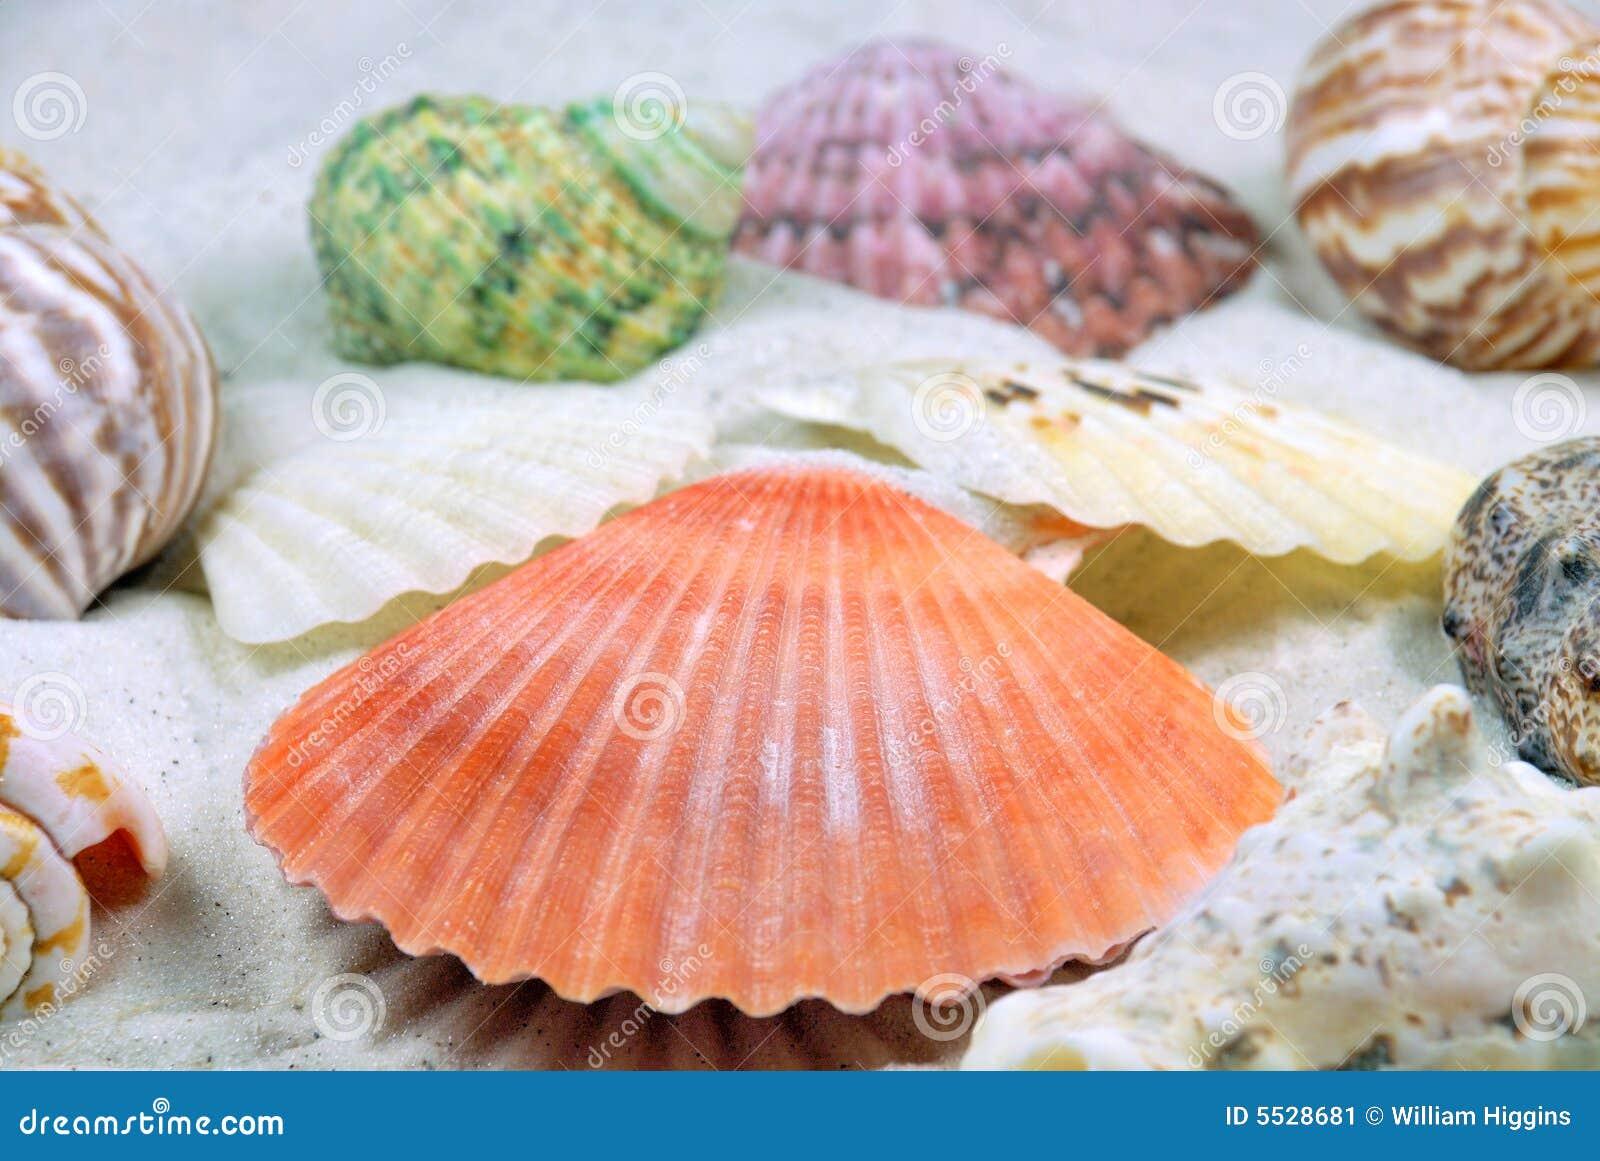 Beach Sea Shells Stock Image - Image: 5528681